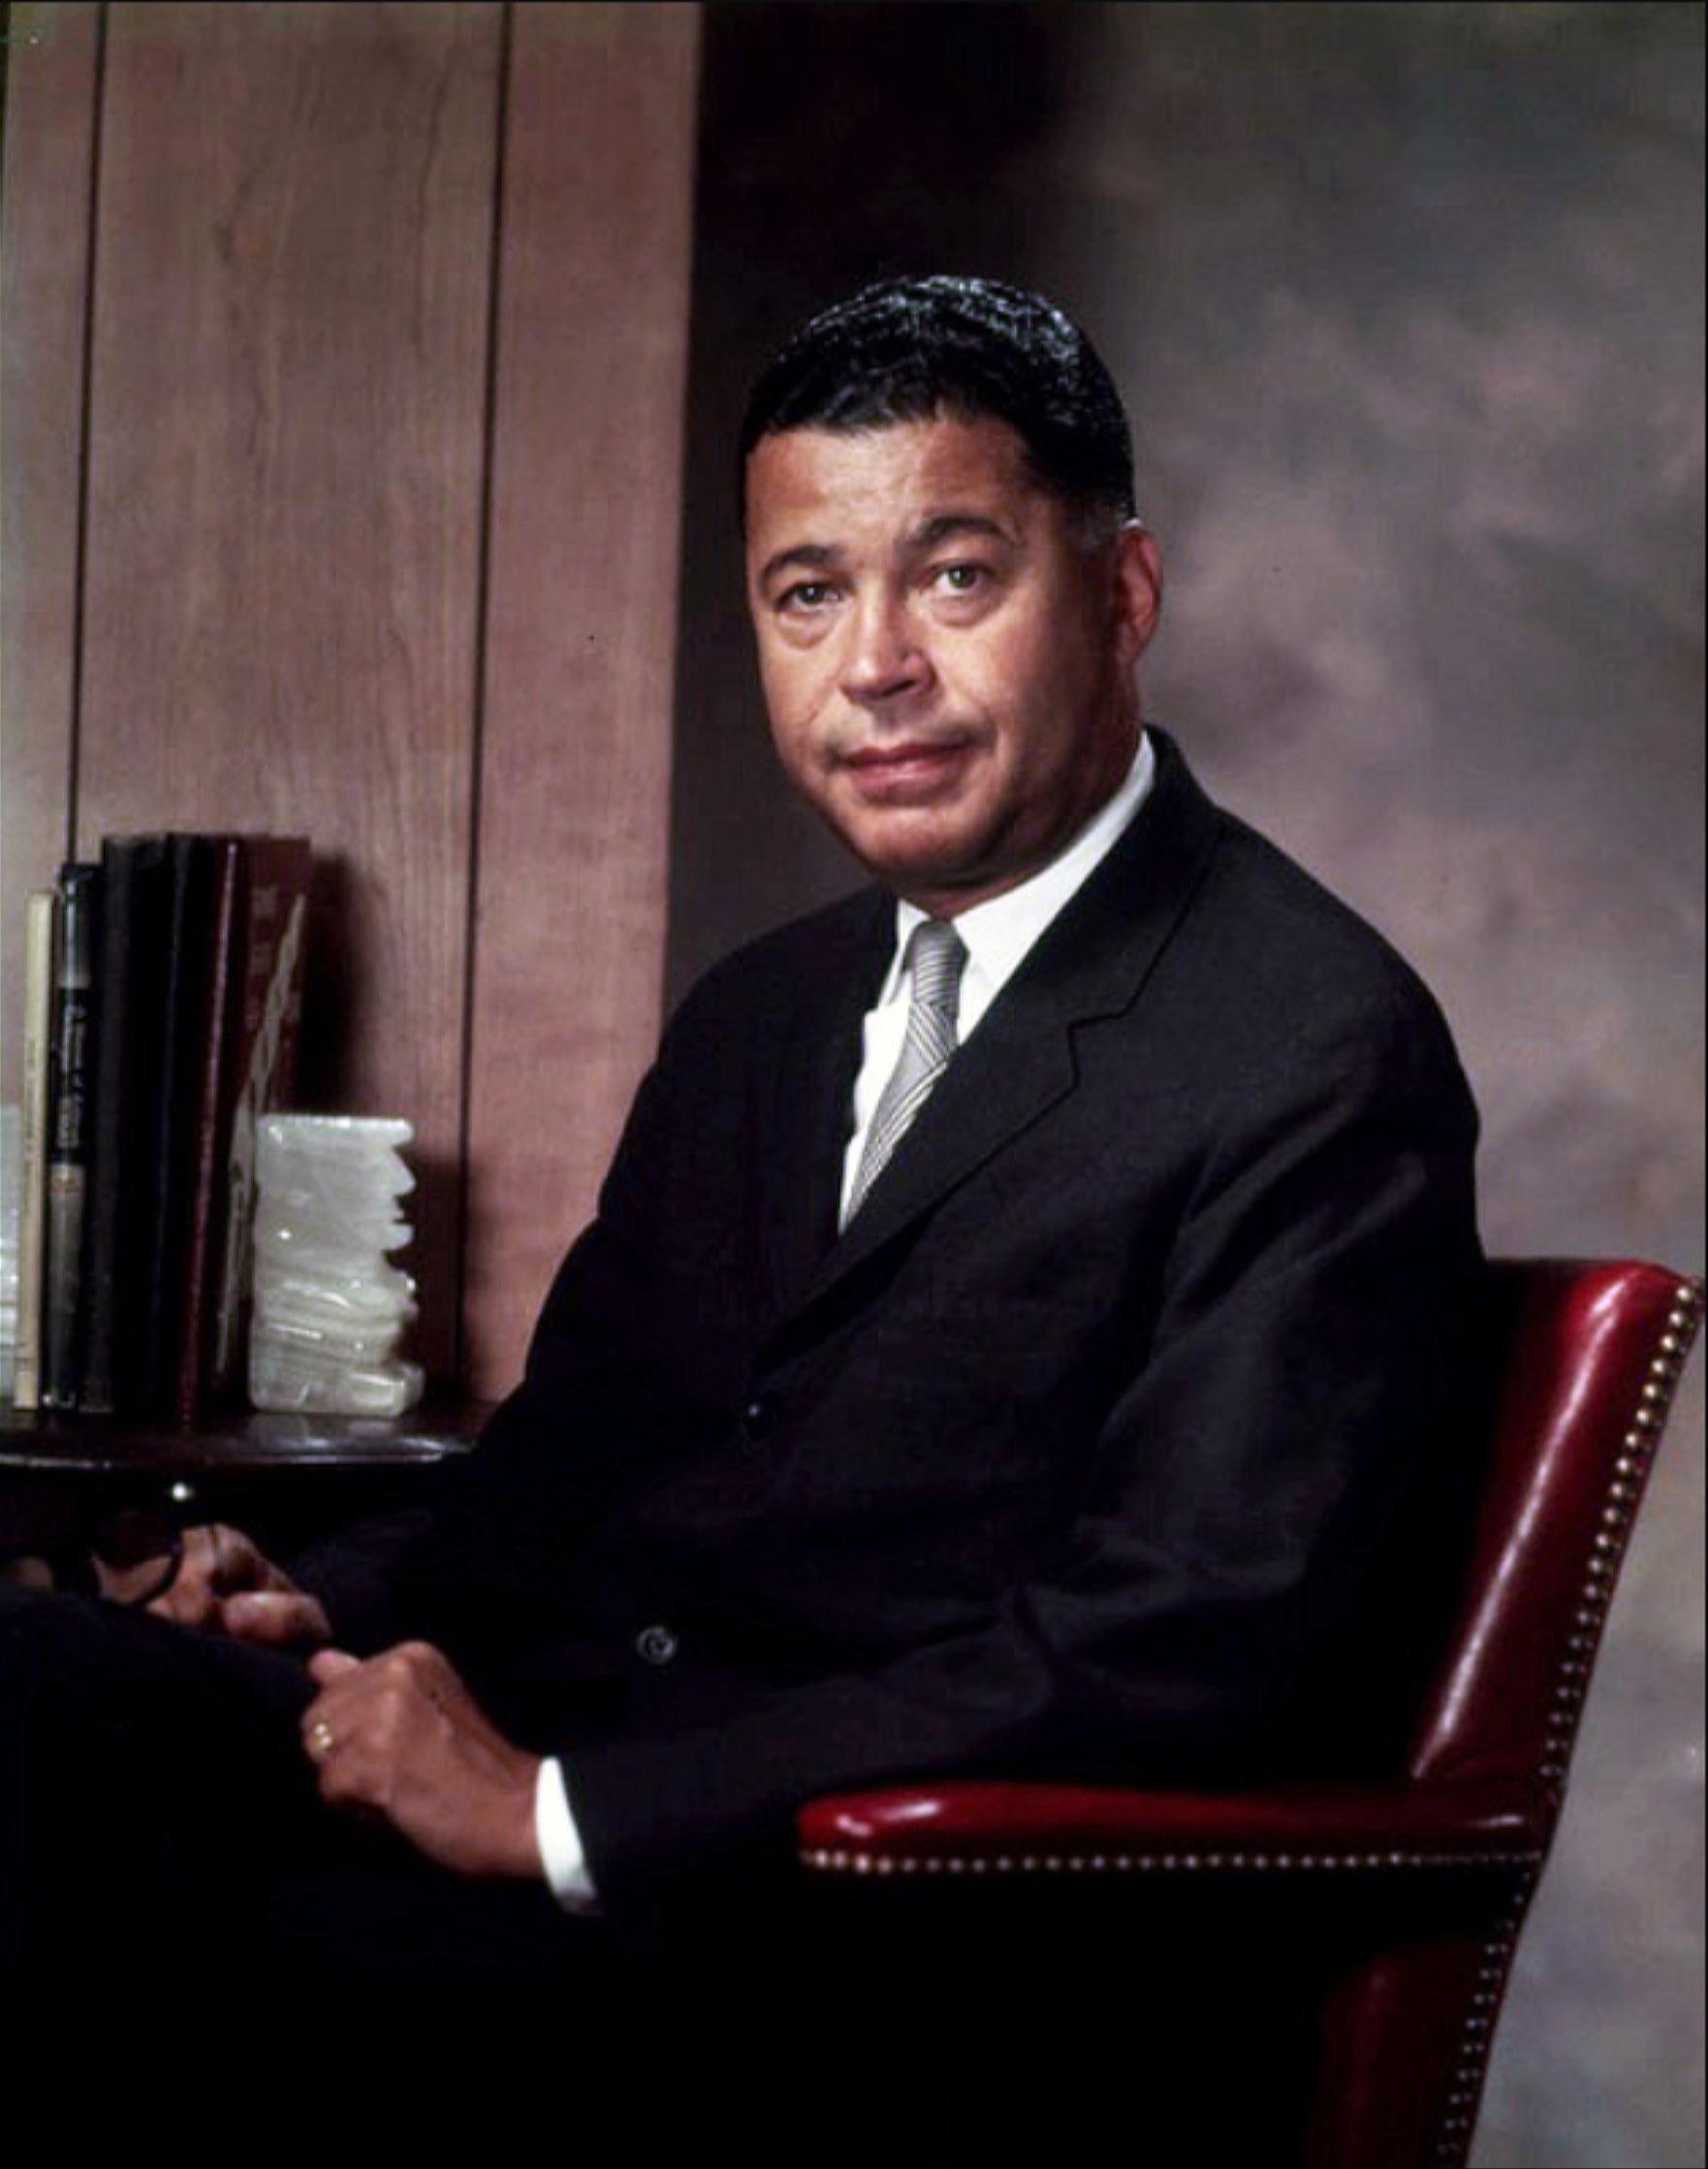 Edward brooke senator